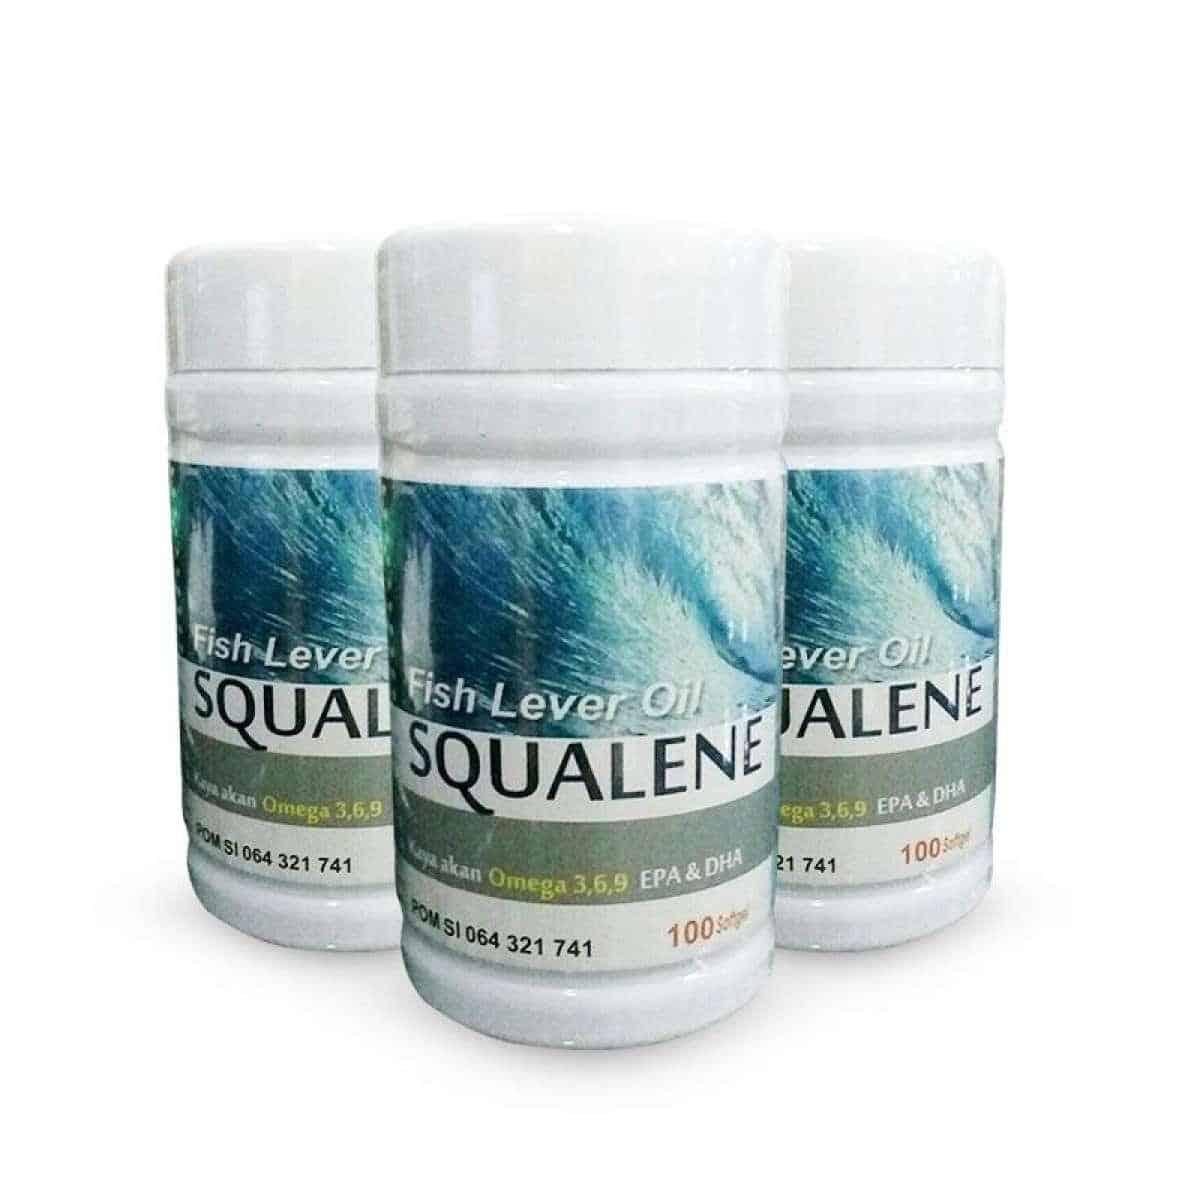 Squalene-Salmon-Fish-Liver-Oil-Omega